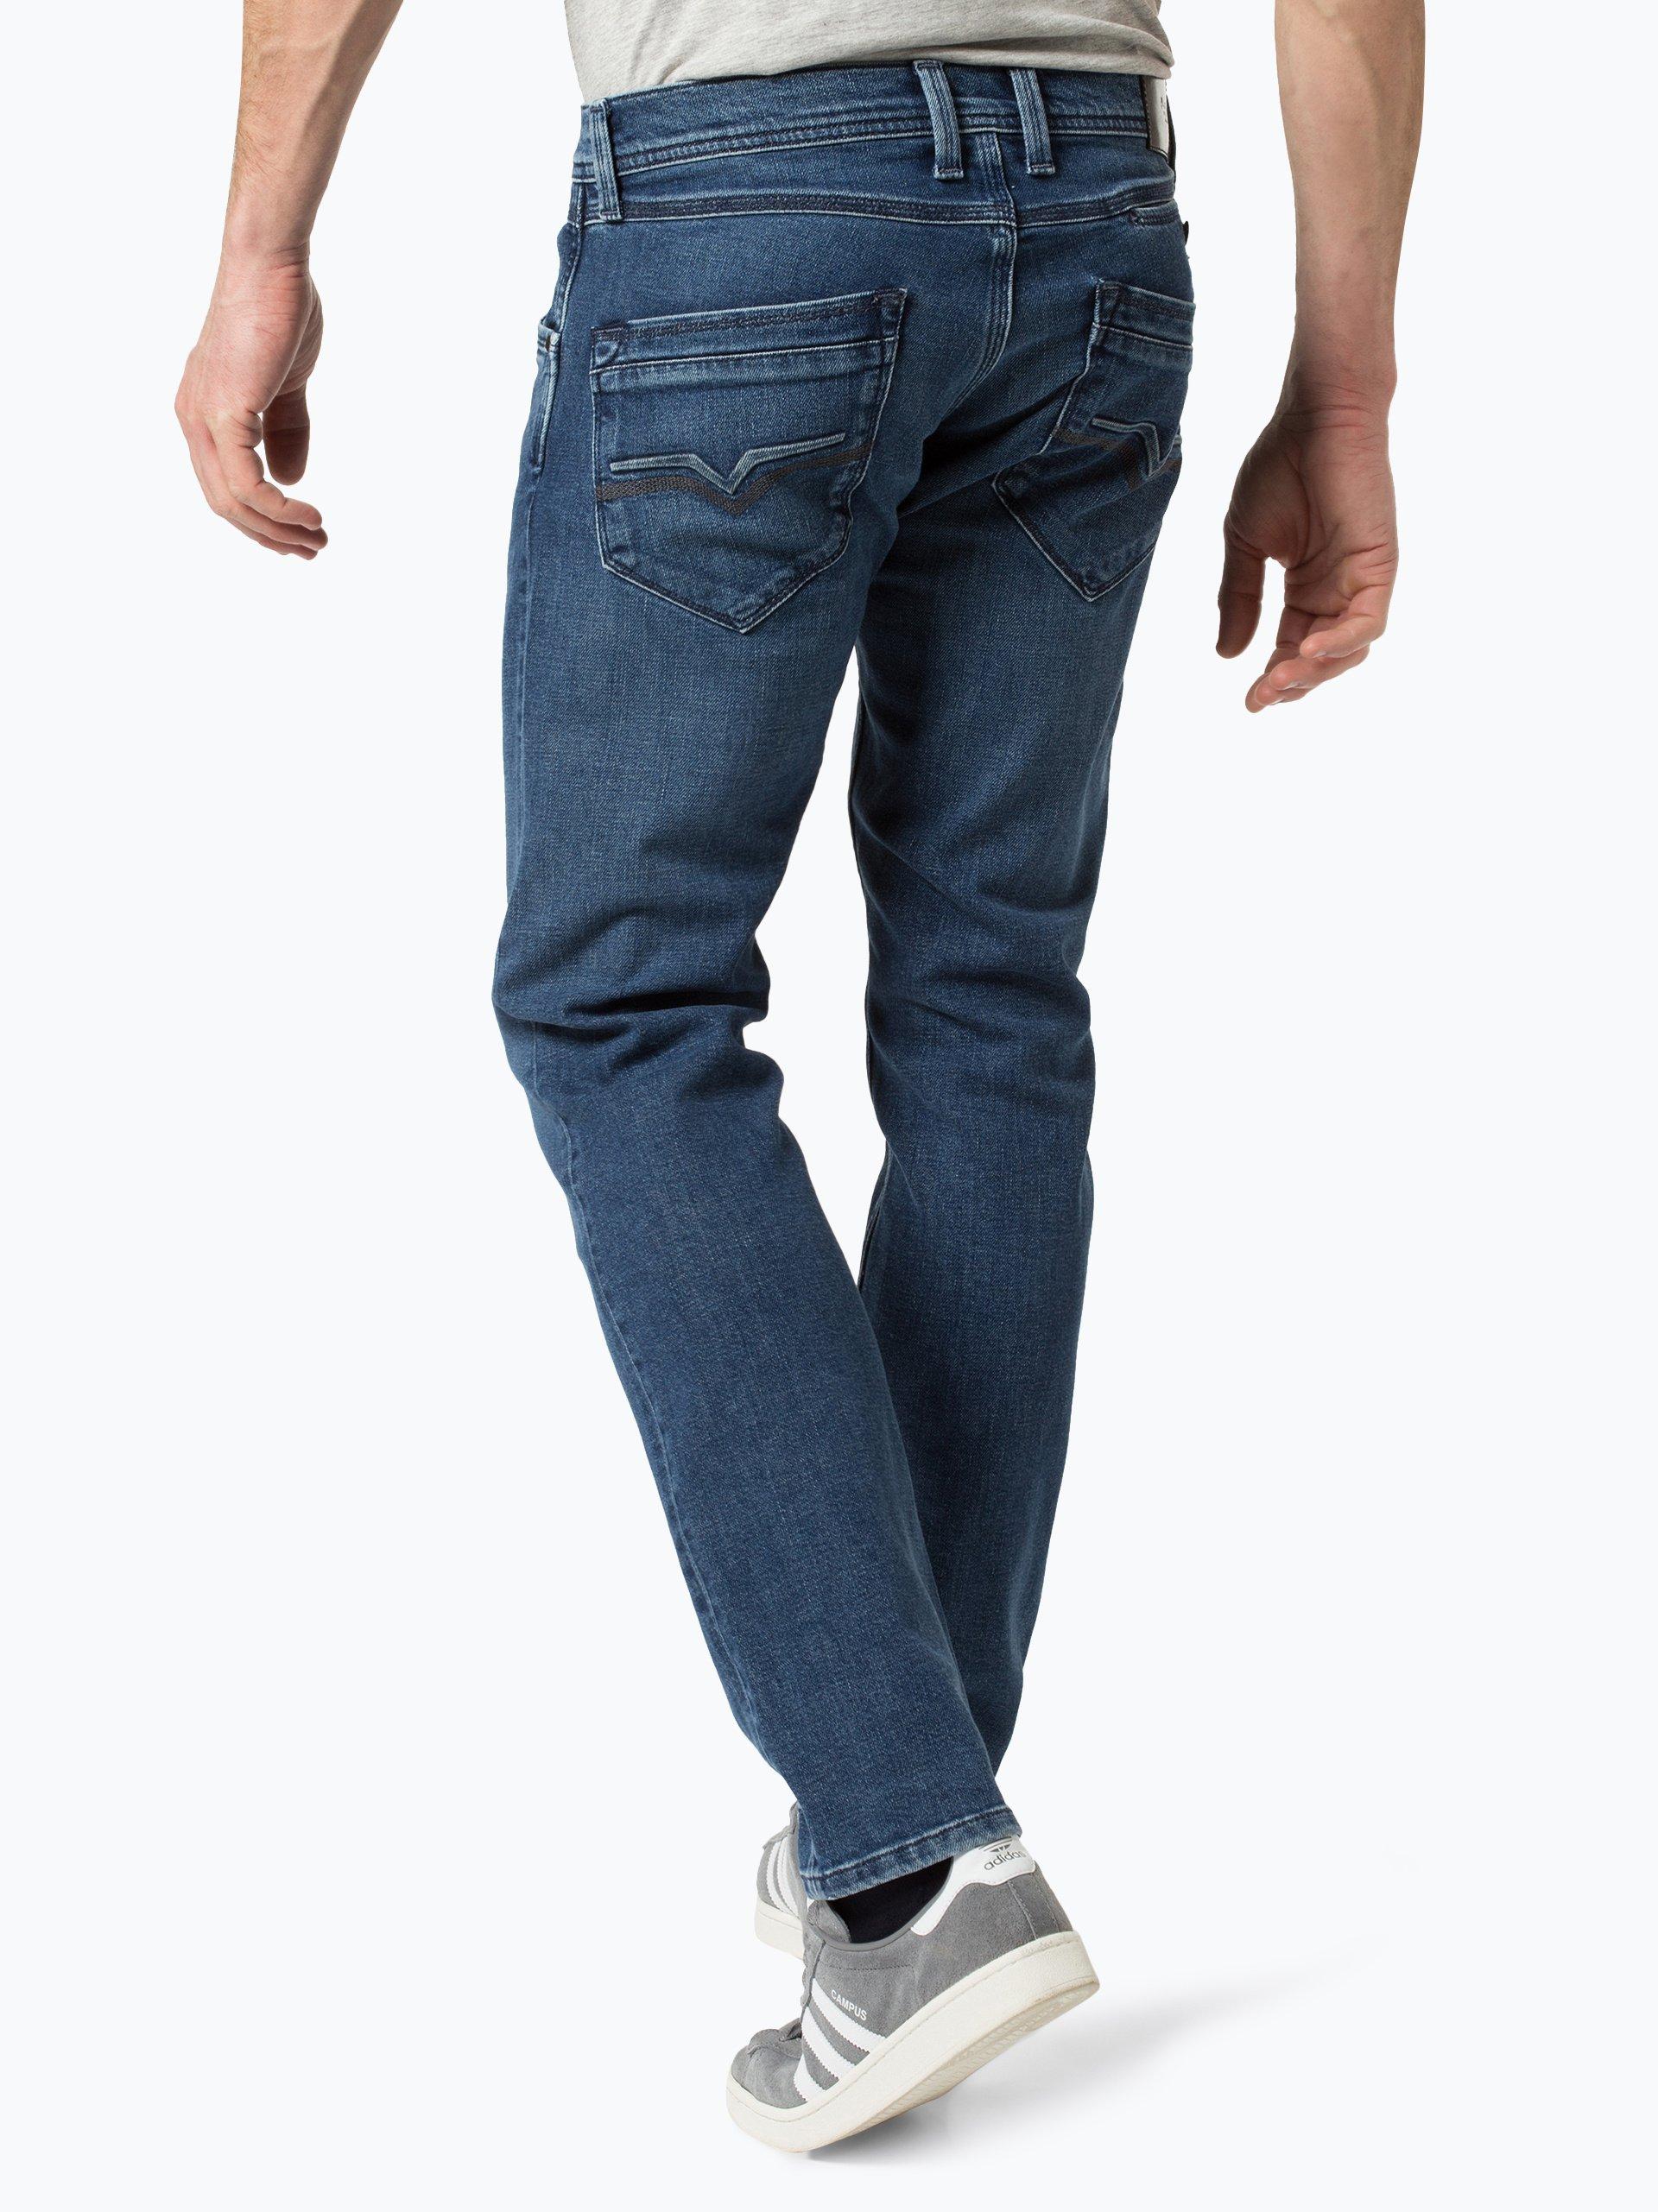 pepe jeans herren jeans spike blue stone uni online kaufen peek und cloppenburg de. Black Bedroom Furniture Sets. Home Design Ideas